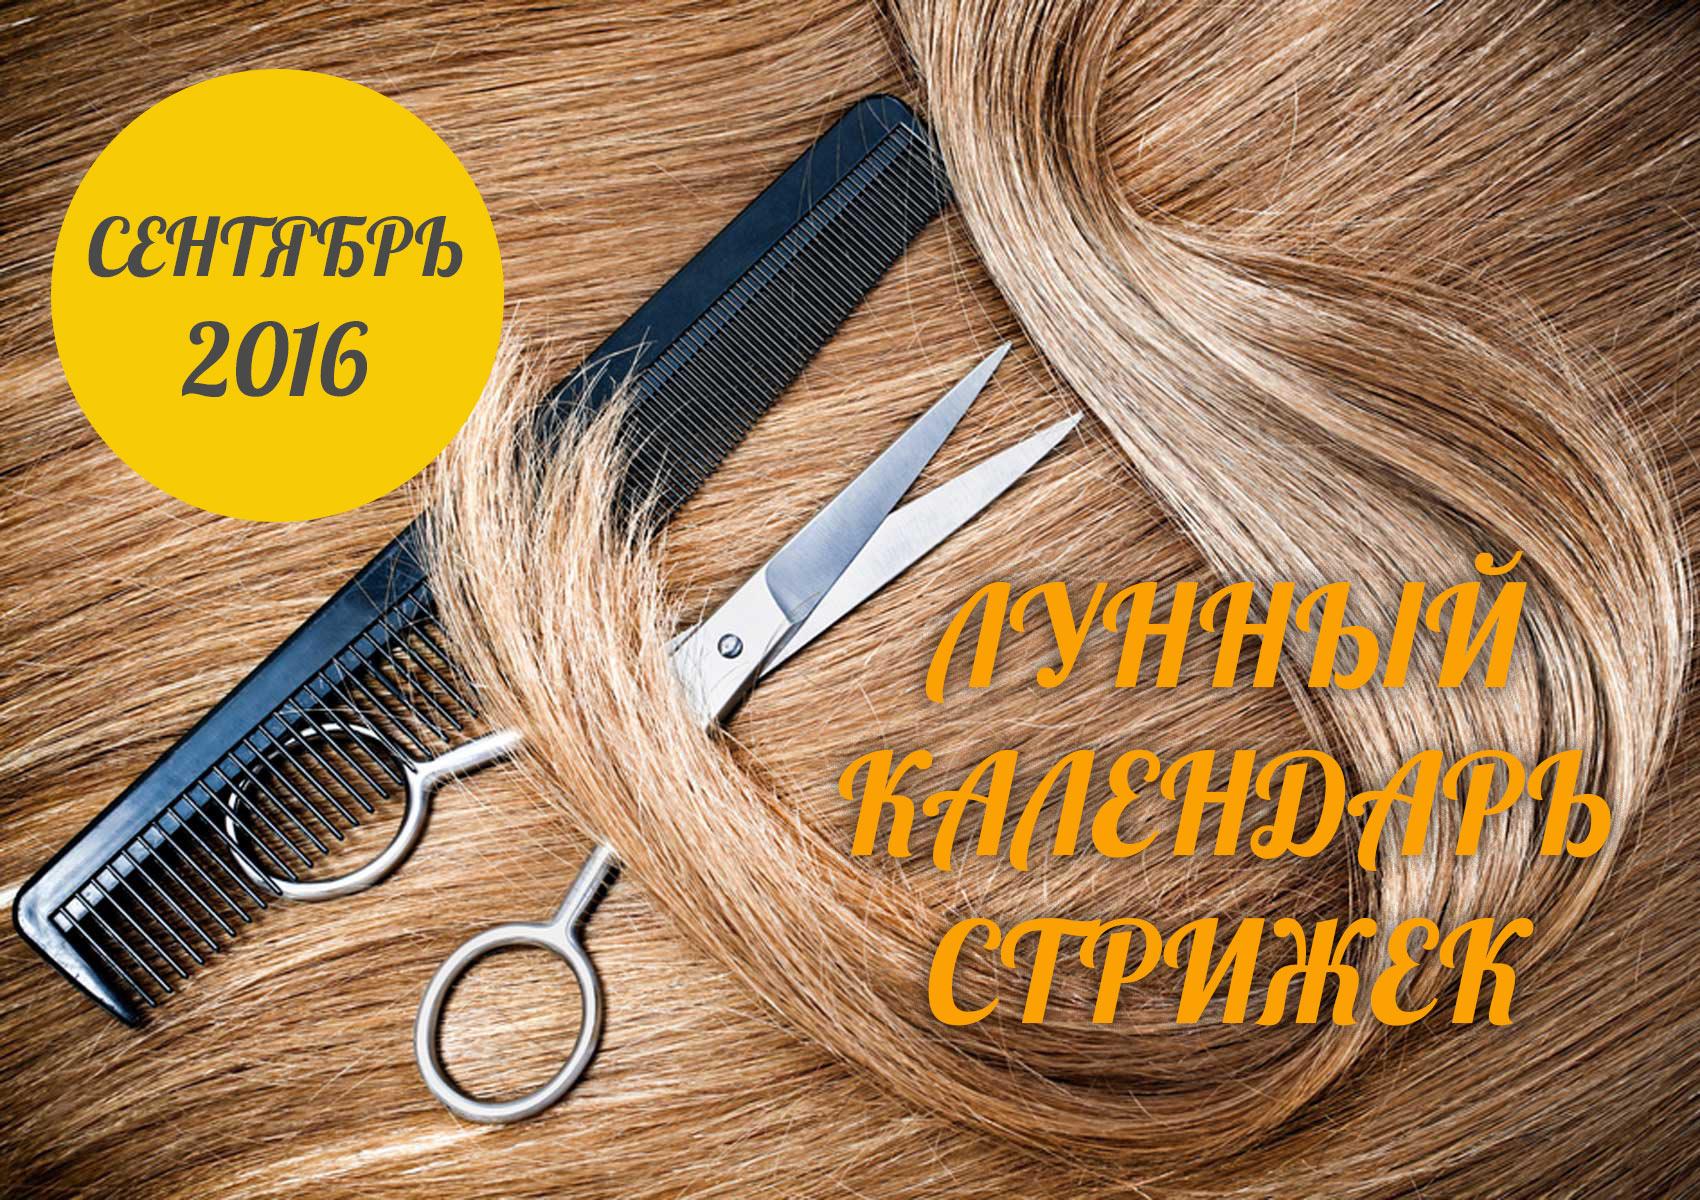 Рыболовный календарь на 2017 краснодарский край